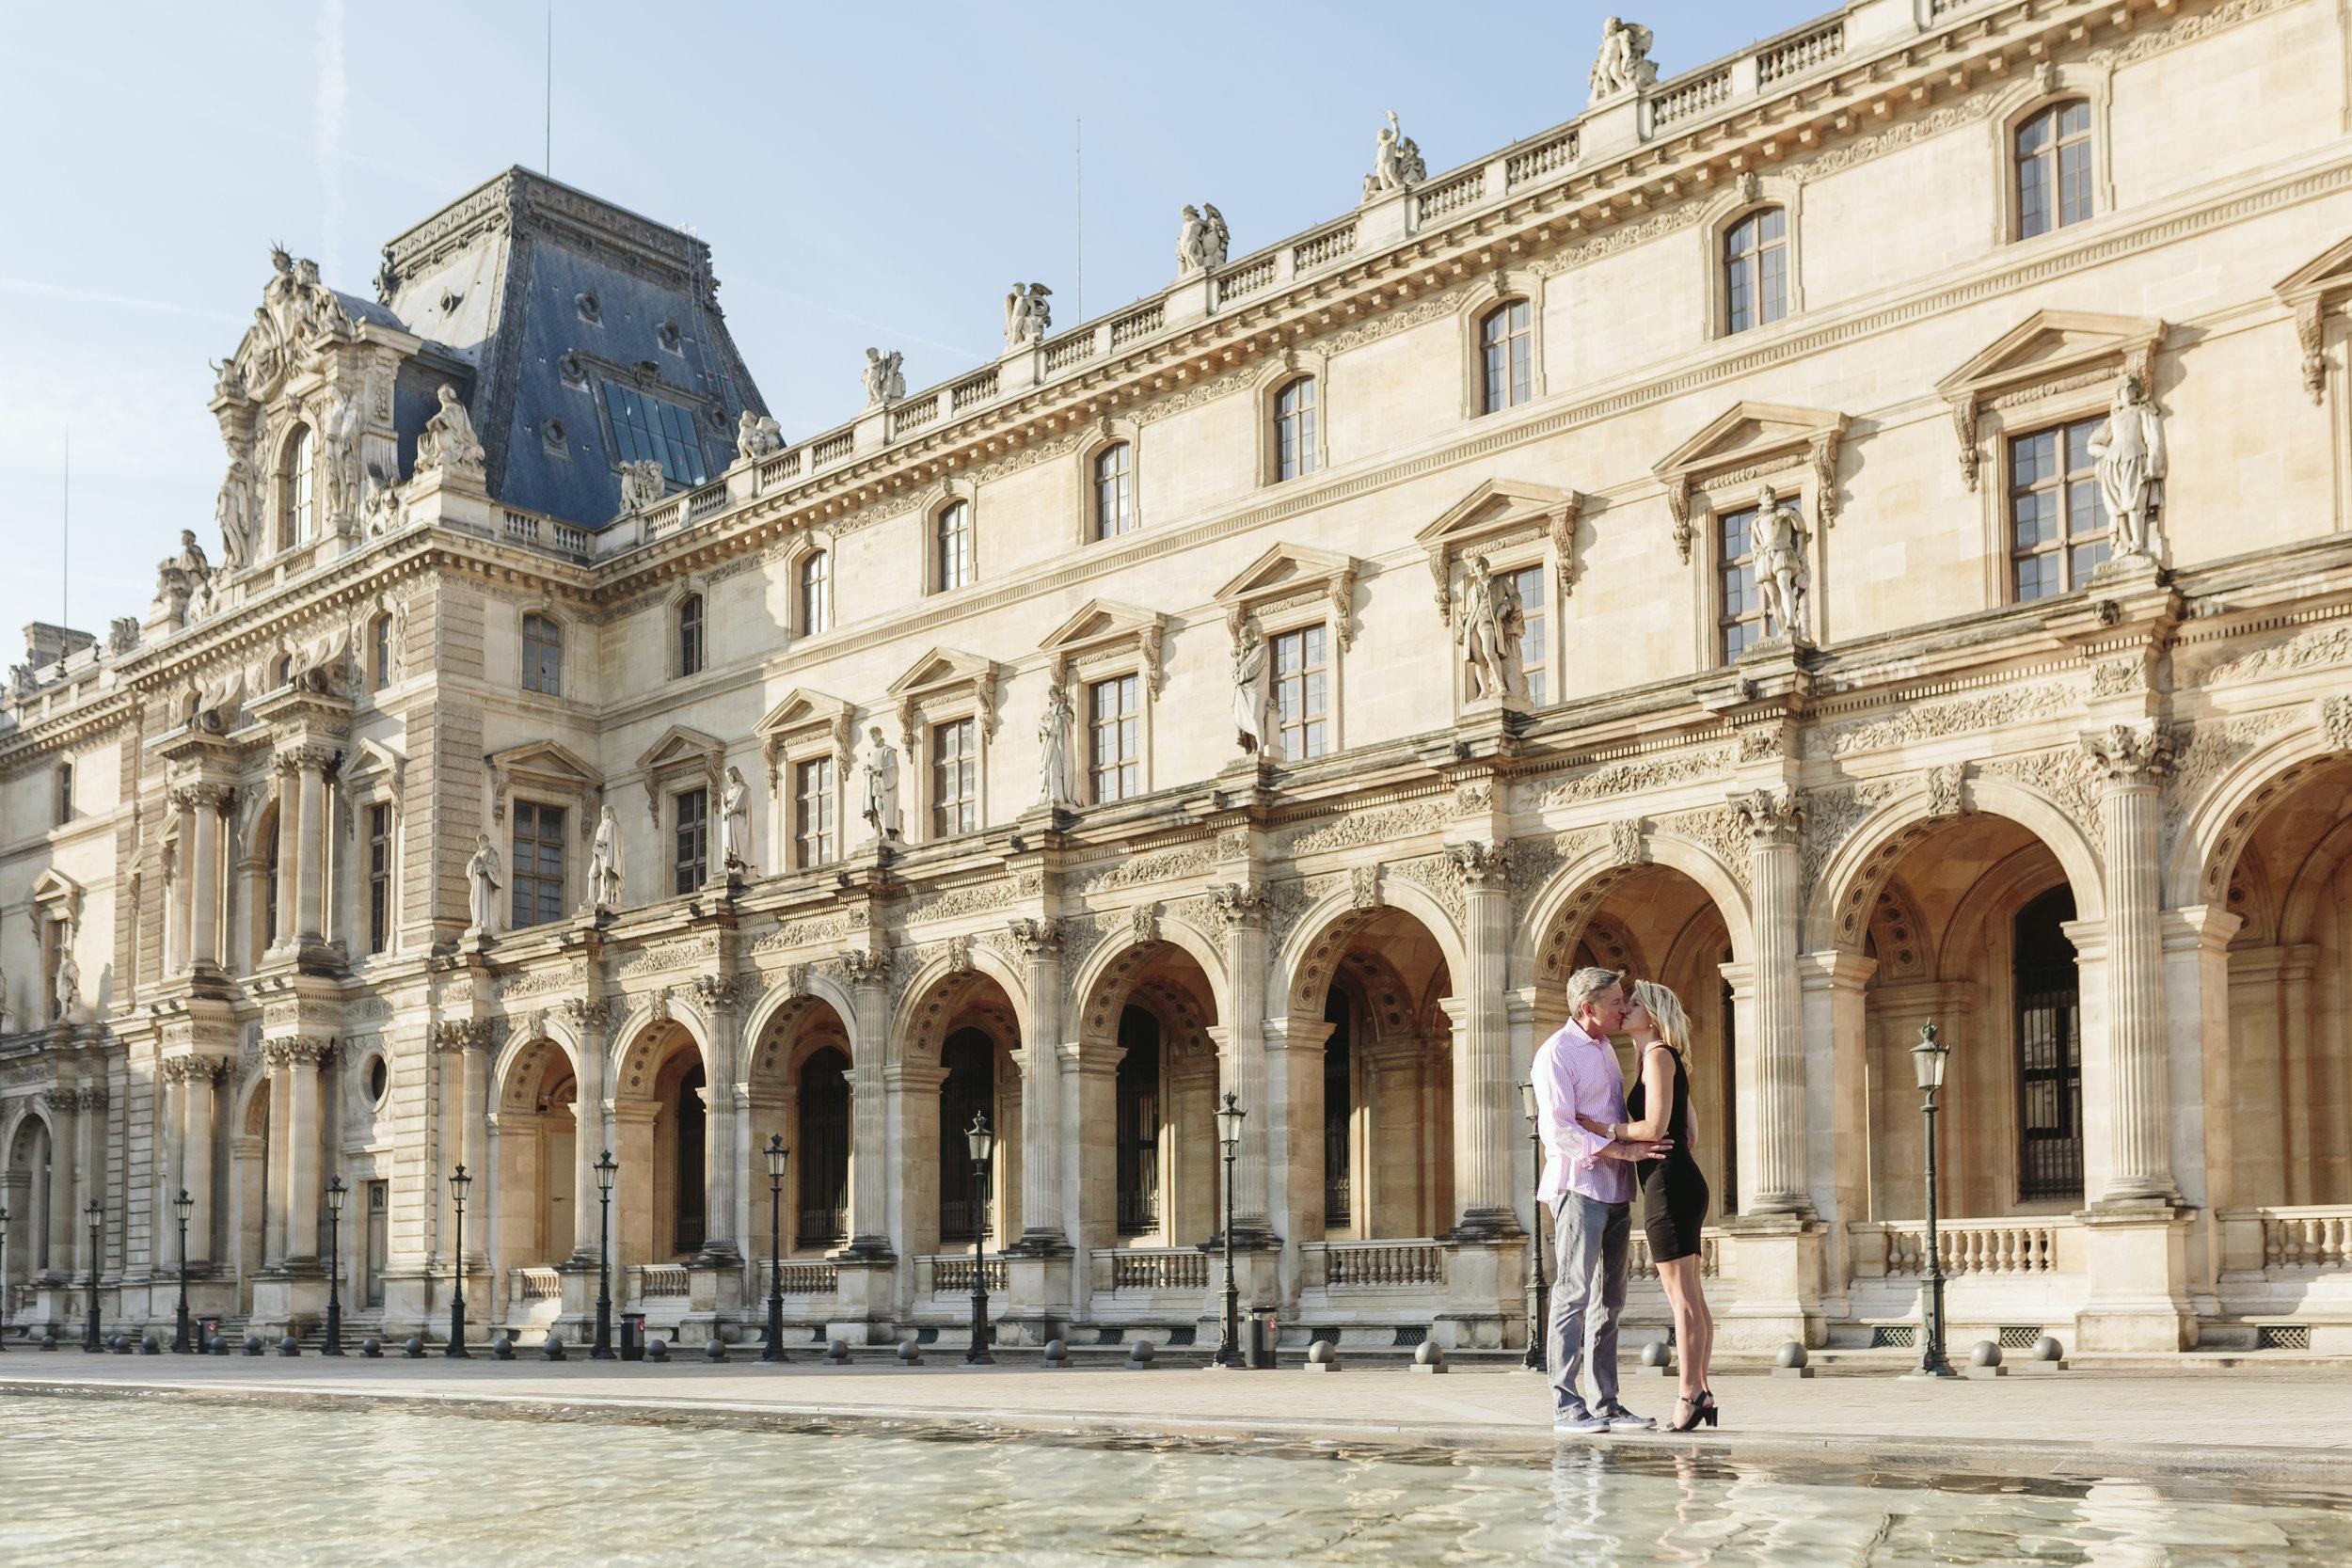 paris photographer federico guendel couple romantic portrait session at the courtyard of louvre museum